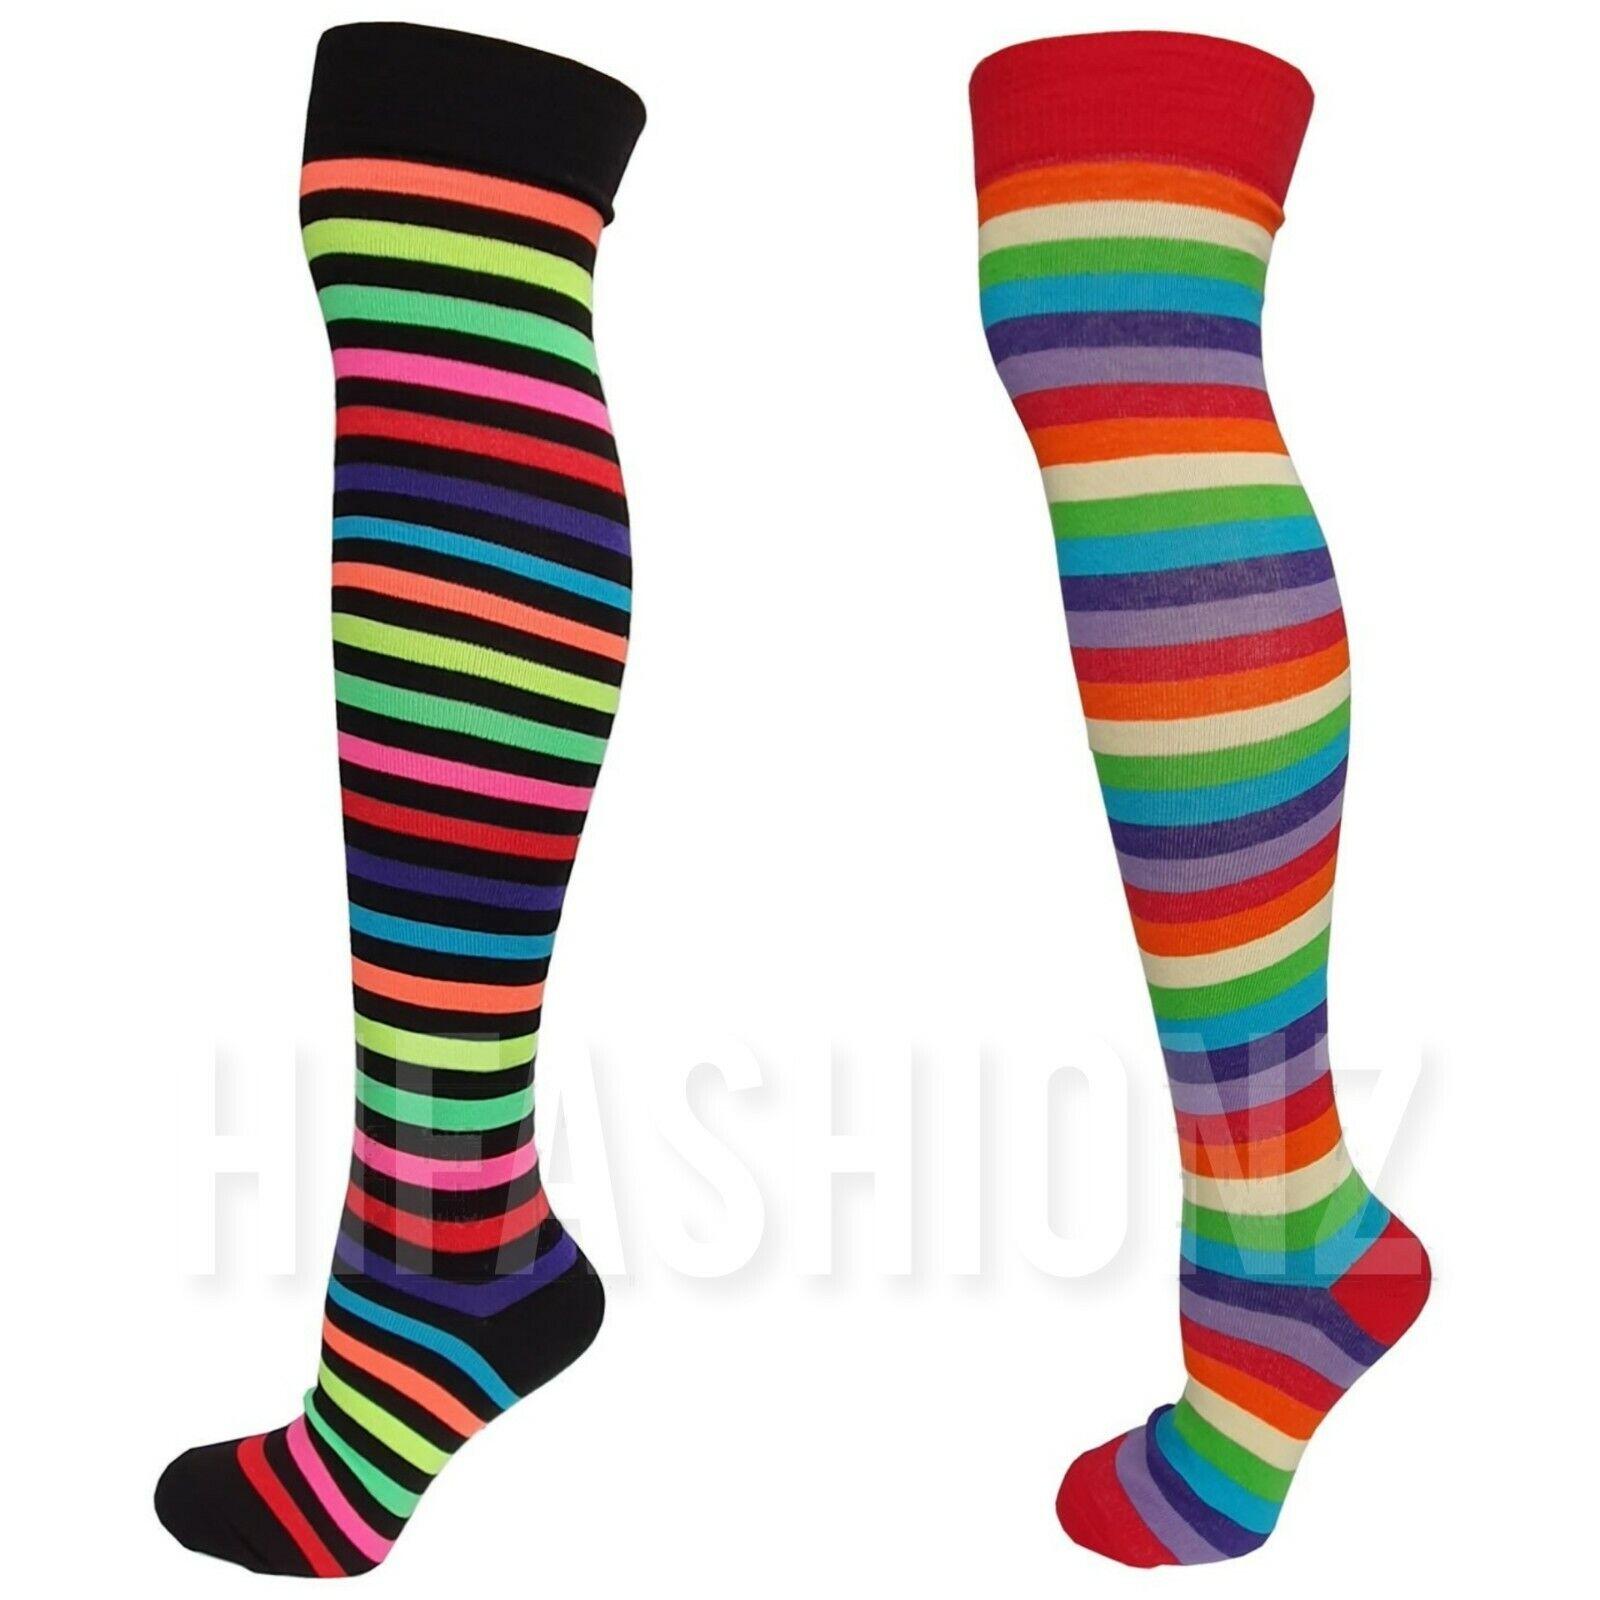 Damen NEON Streifen Overknee Socken Regenbogen Clown Gothic Kostüm Party